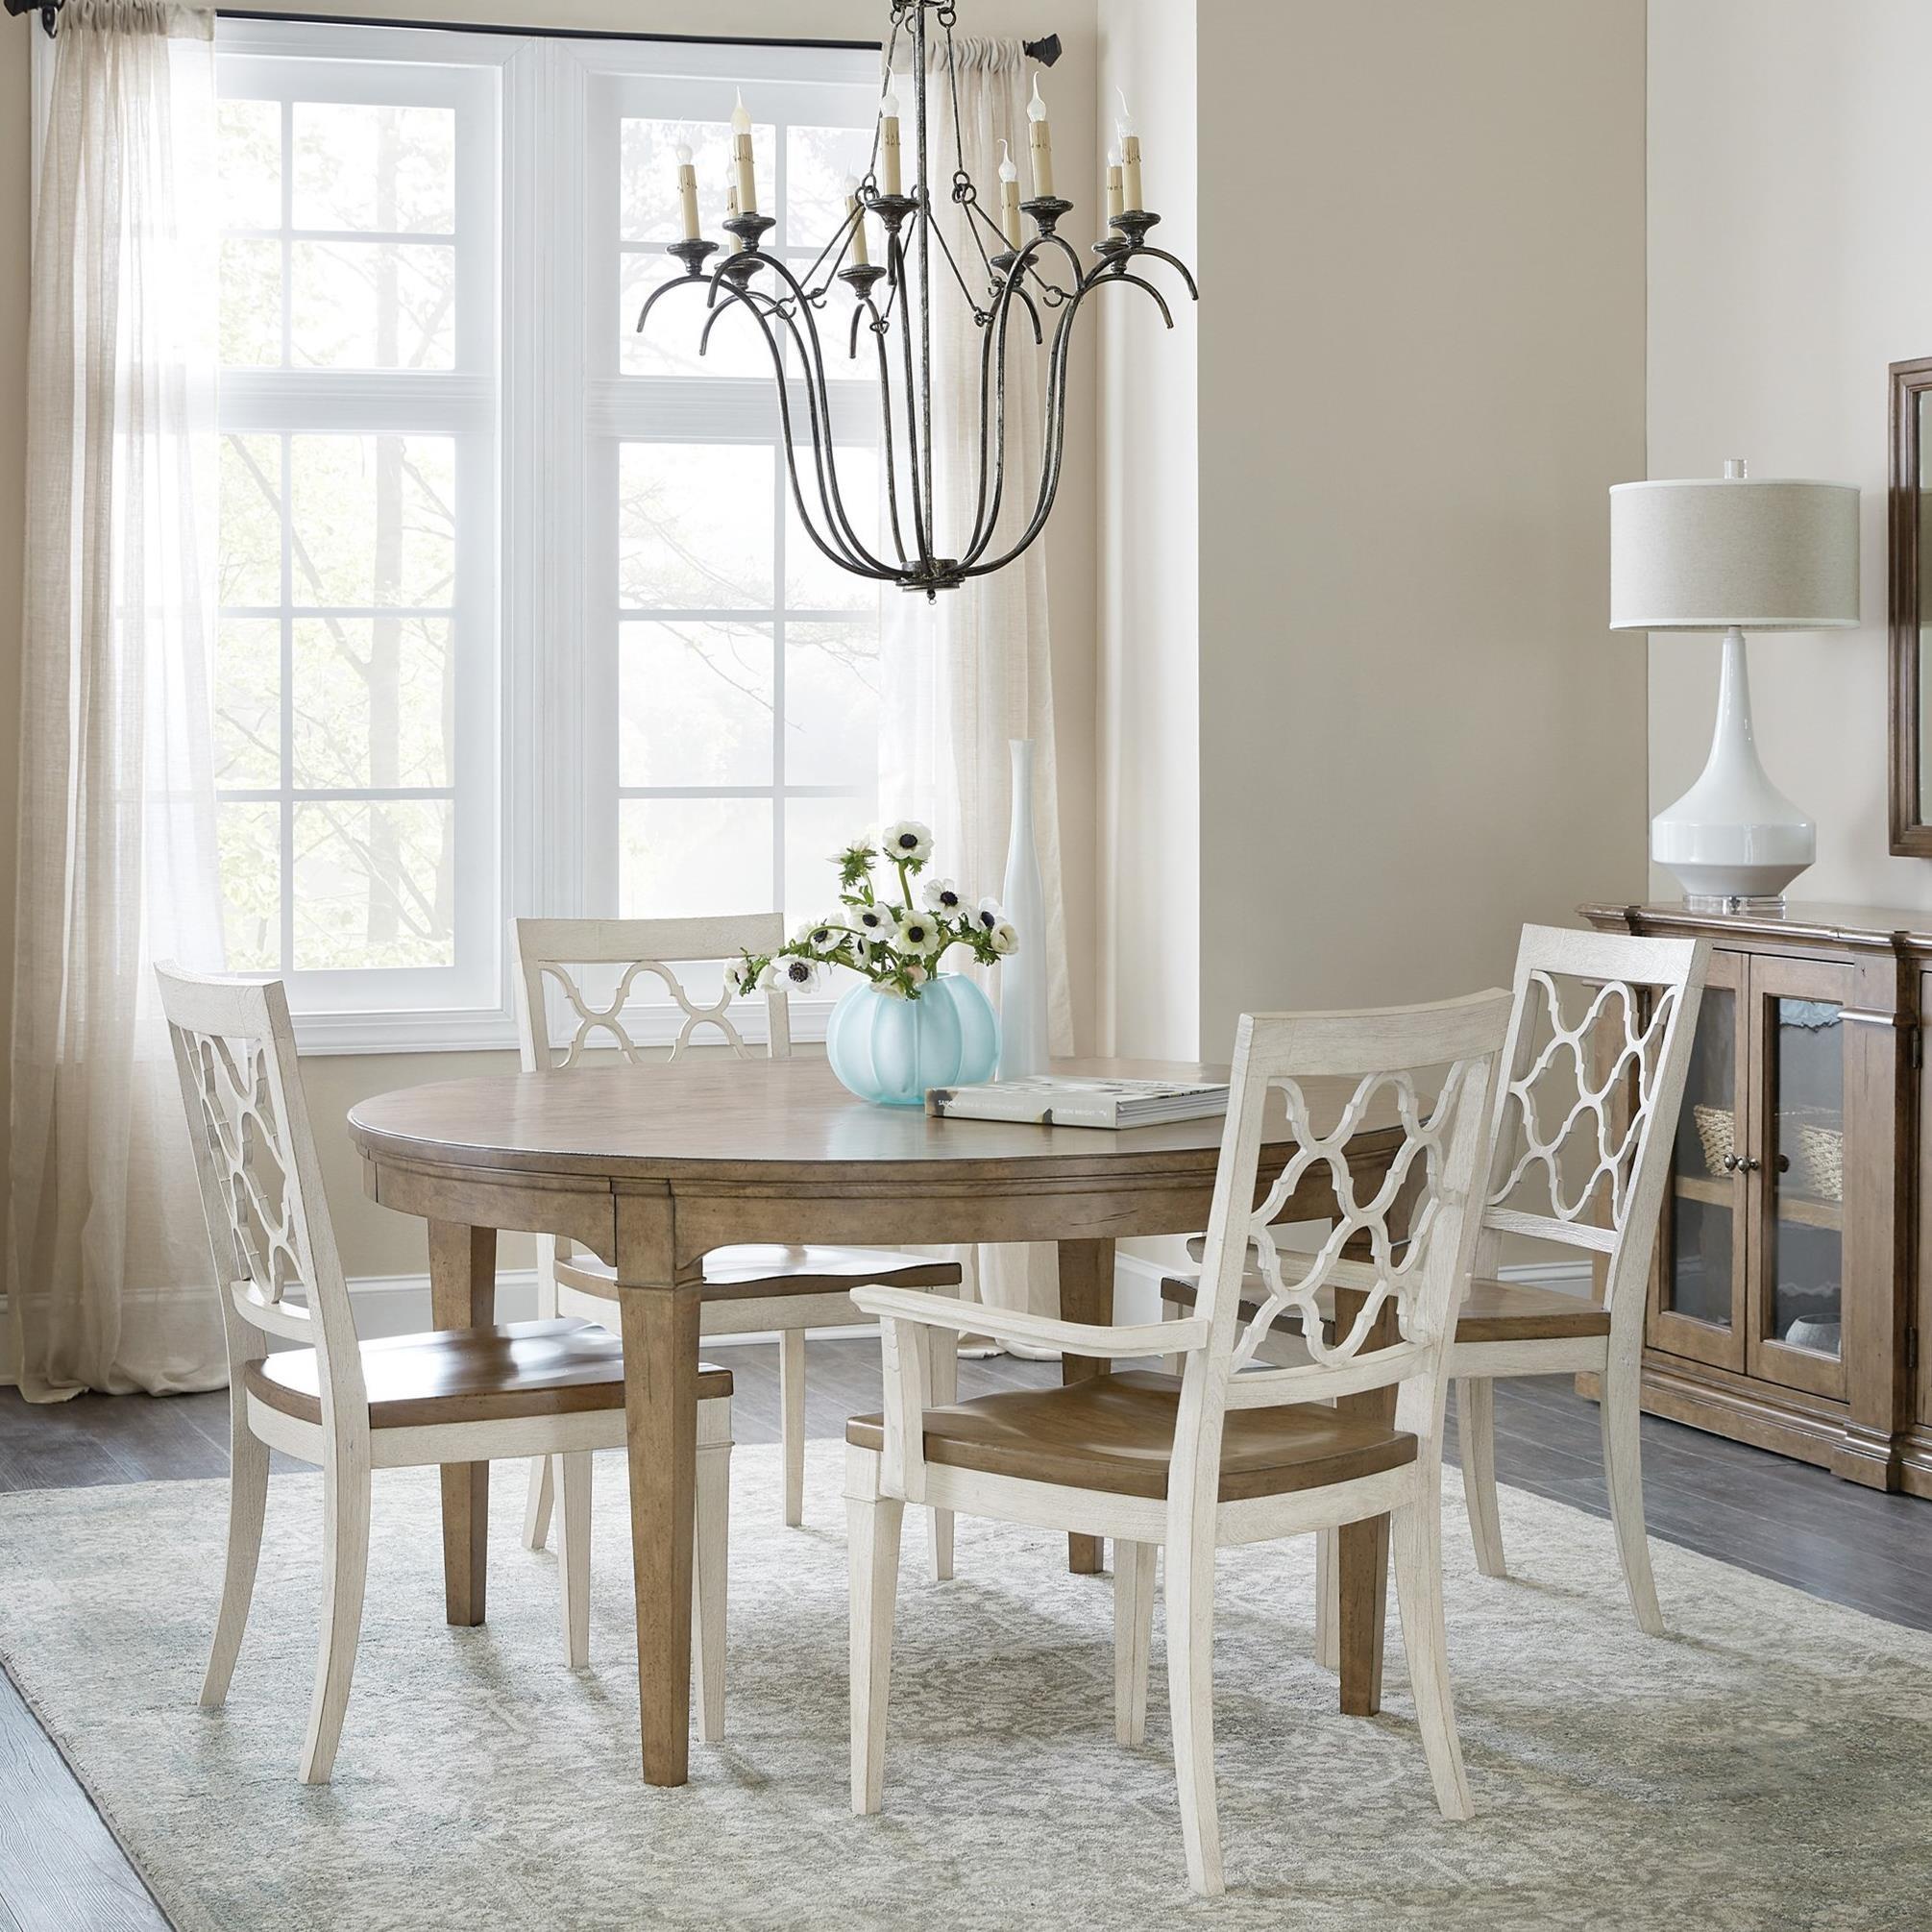 Montebello 5-Piece Dining Set by Hooker Furniture at Baer's Furniture